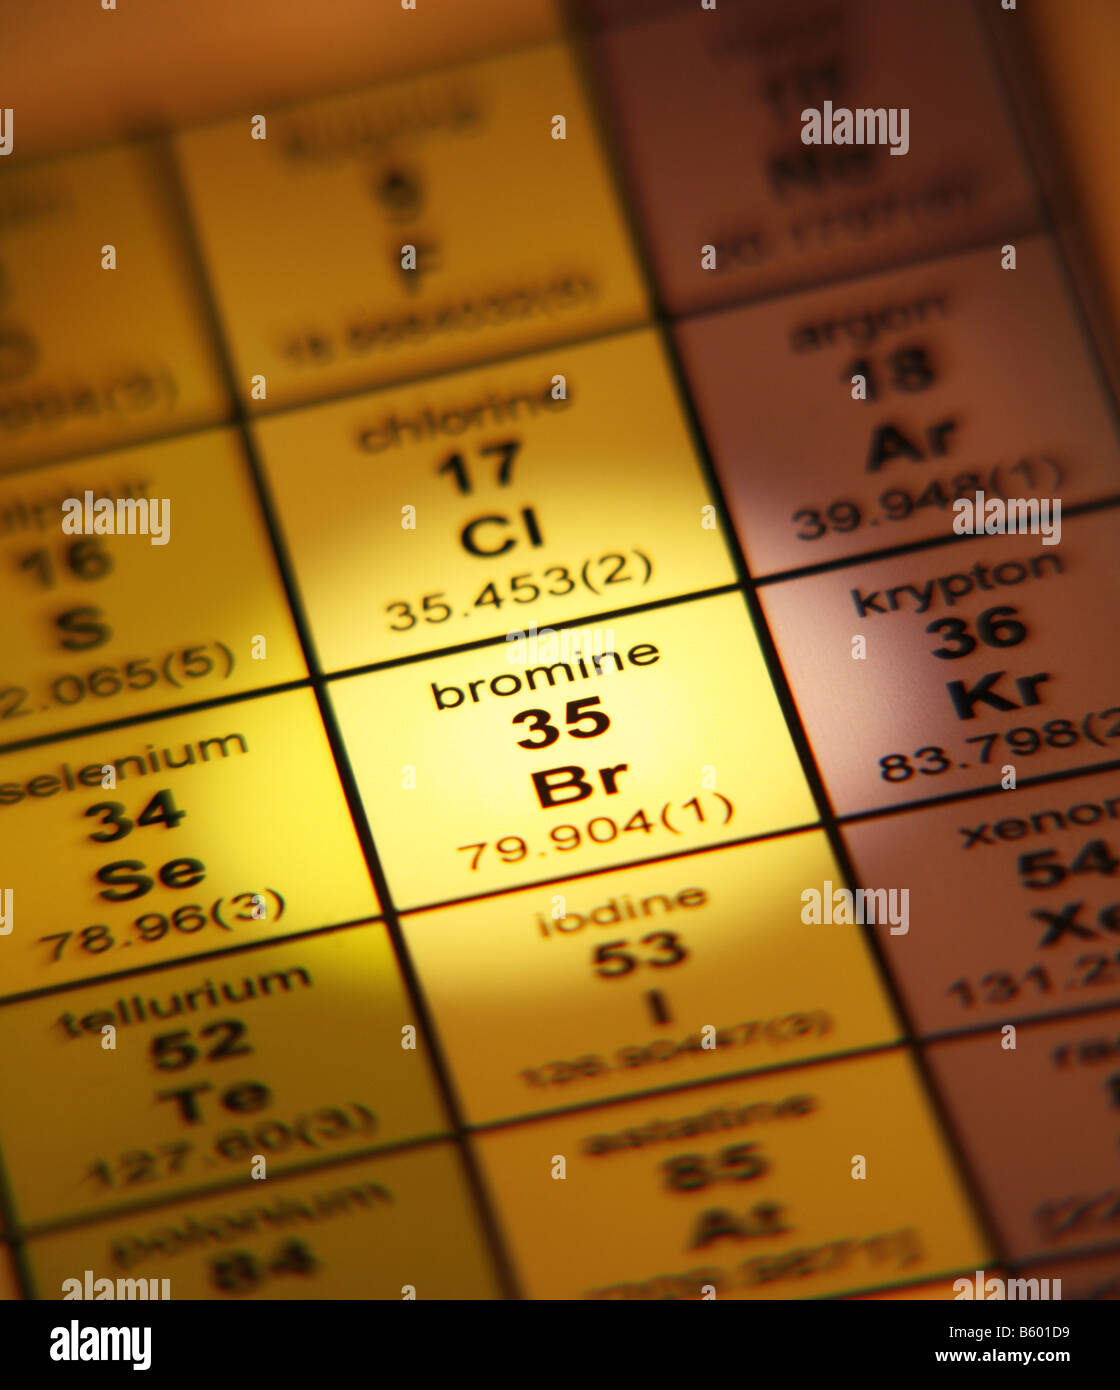 Periodic table of elements bromine halogen stock photo 20899461 alamy periodic table of elements bromine halogen urtaz Images